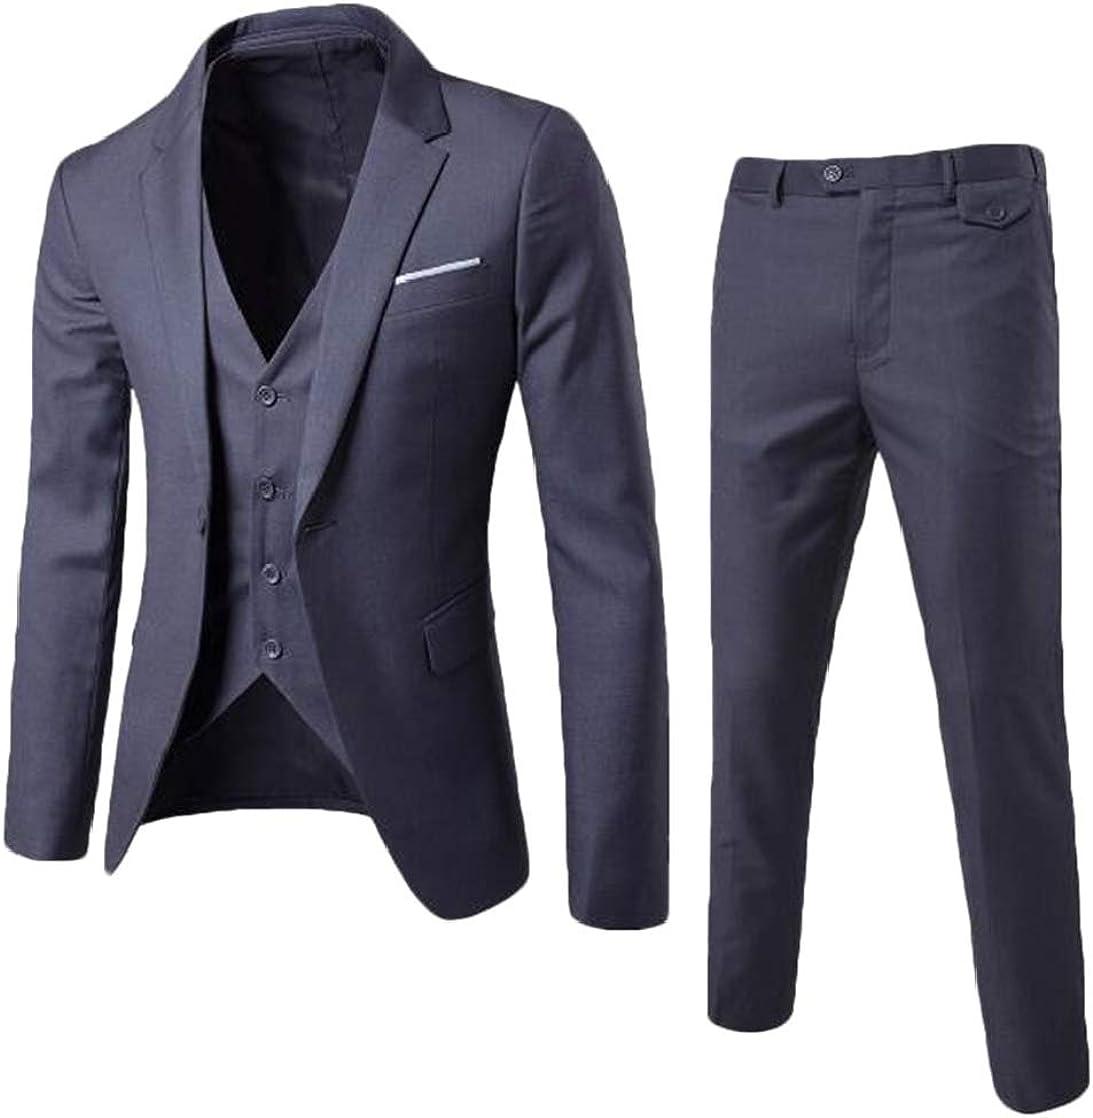 KLJR Men Casual Wedding Blazer Business Suits Sets Outfits